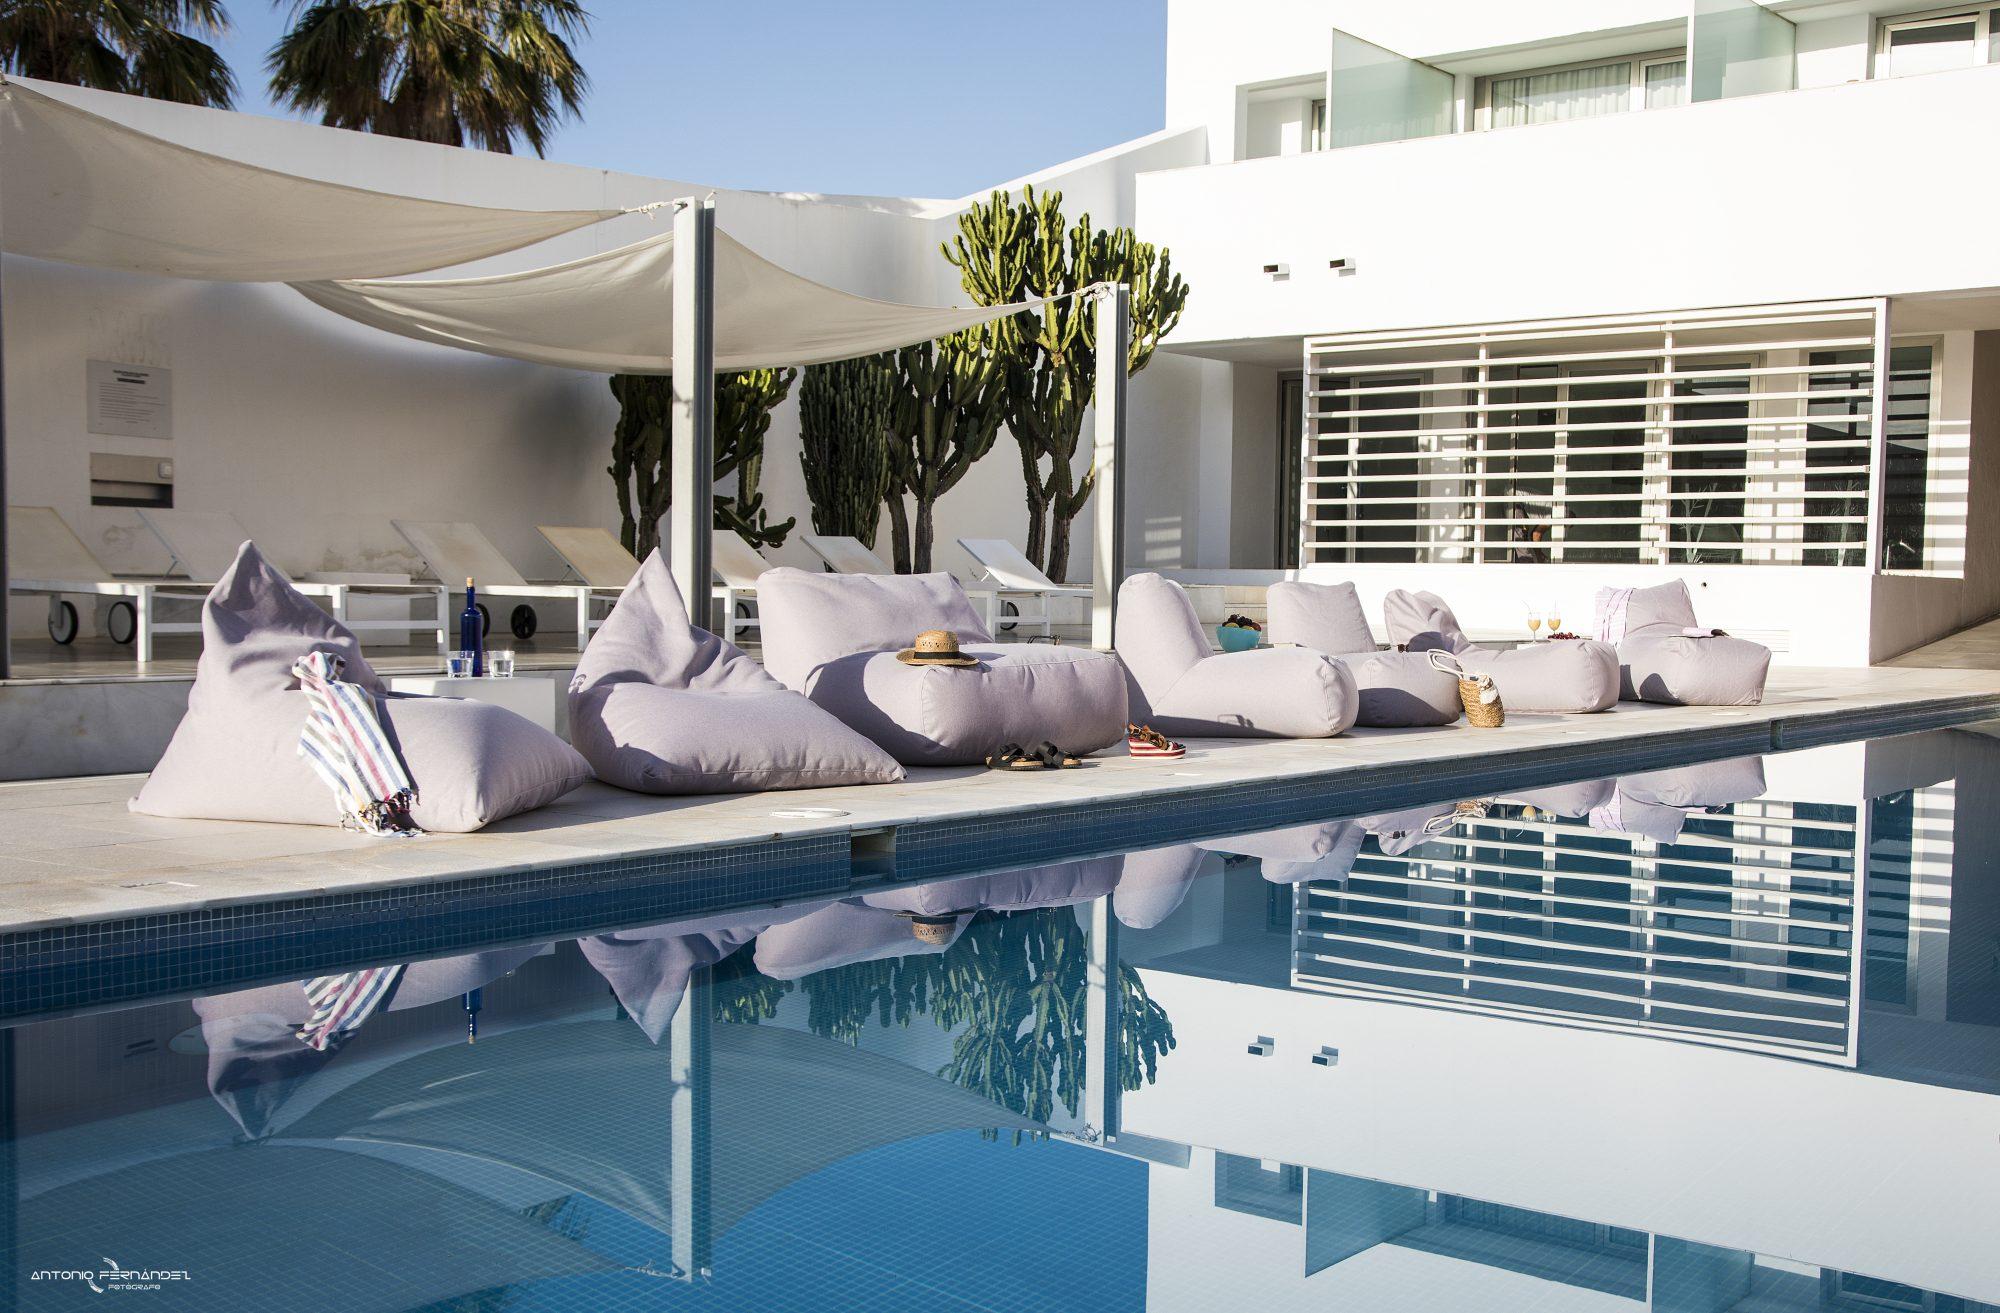 Riviera bean bags – Razz, Sofa Tube, Tube, Lounge – Pusku pusku 1, Cala Grande, Spain